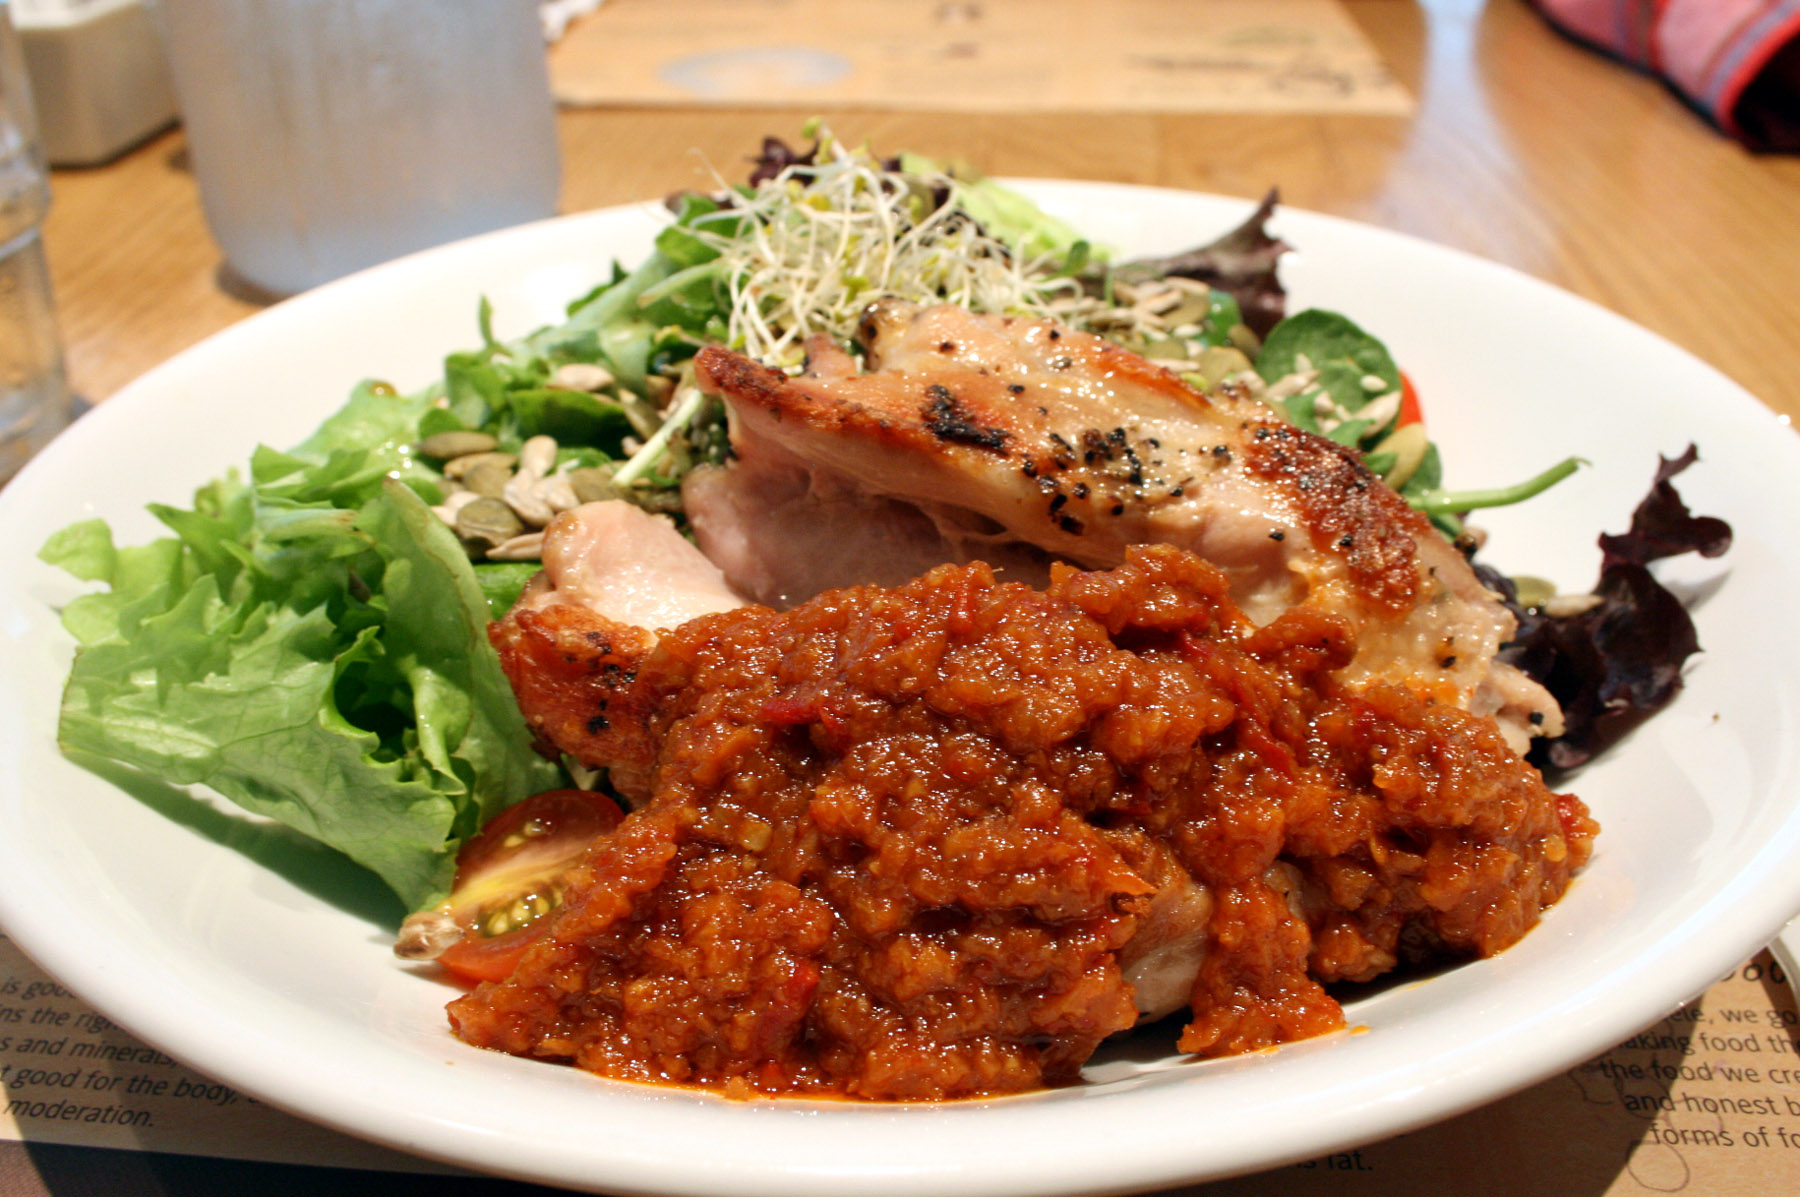 Grilled chicken salad with lemongrass sambal